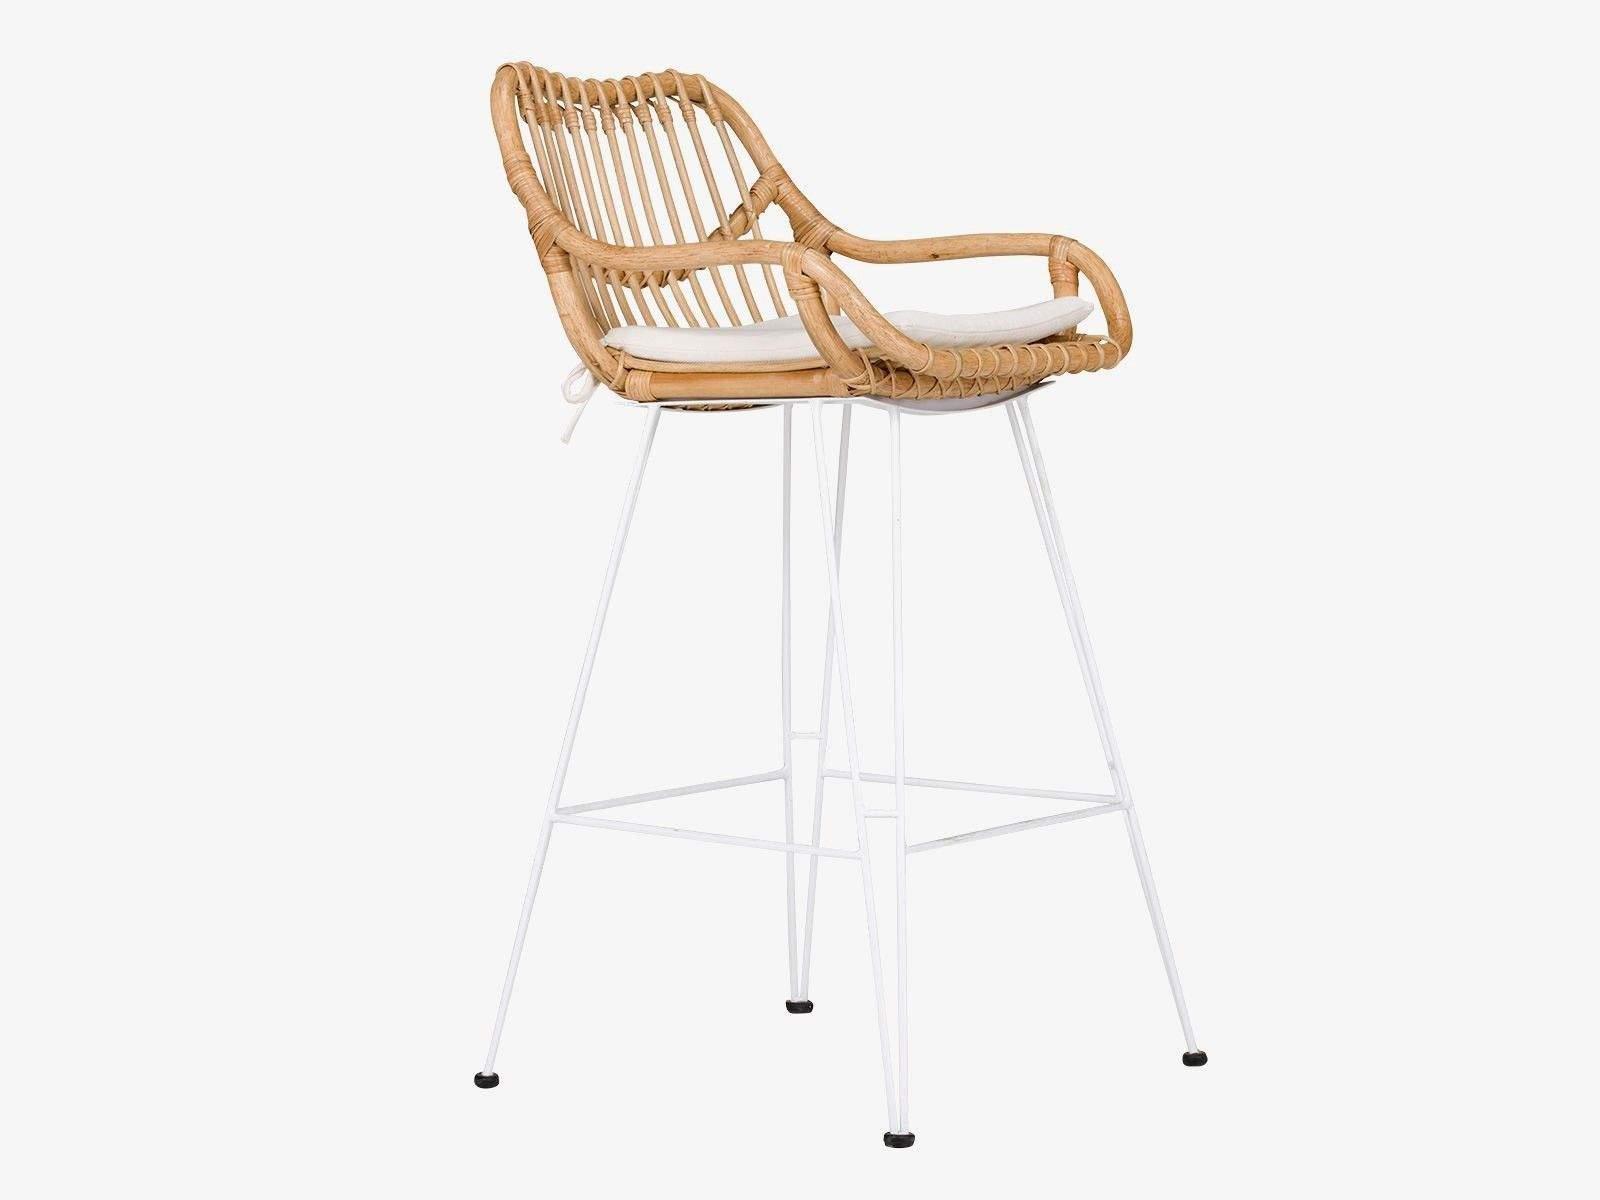 metall stuhl schwarz stuhl schwarz metall eindeutig dr no stuhl elegant bmw x5 3 0d einzigartig